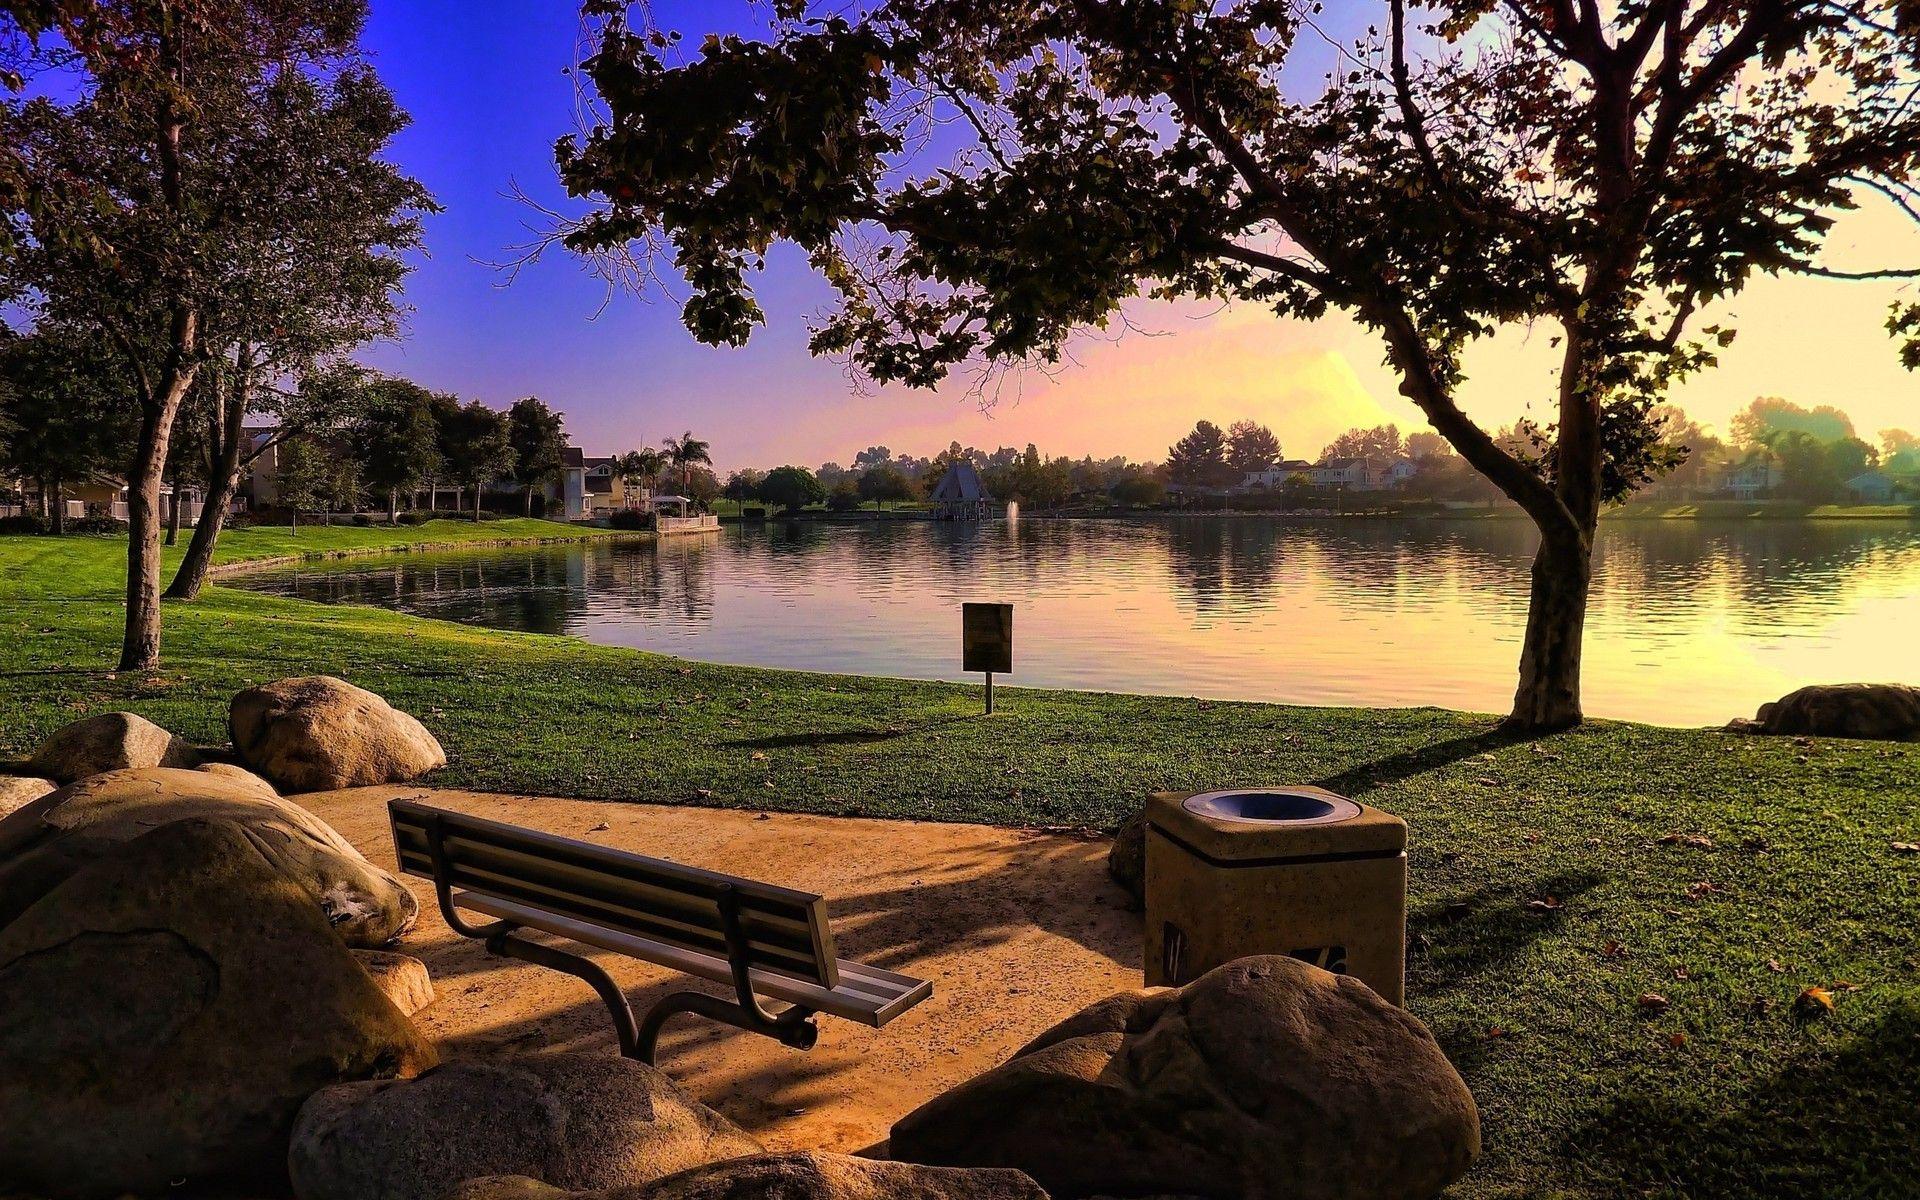 Pin By Tre Shepherd On Cool Phone Wallpapers Landscape Sunset Landscape Lake Landscape